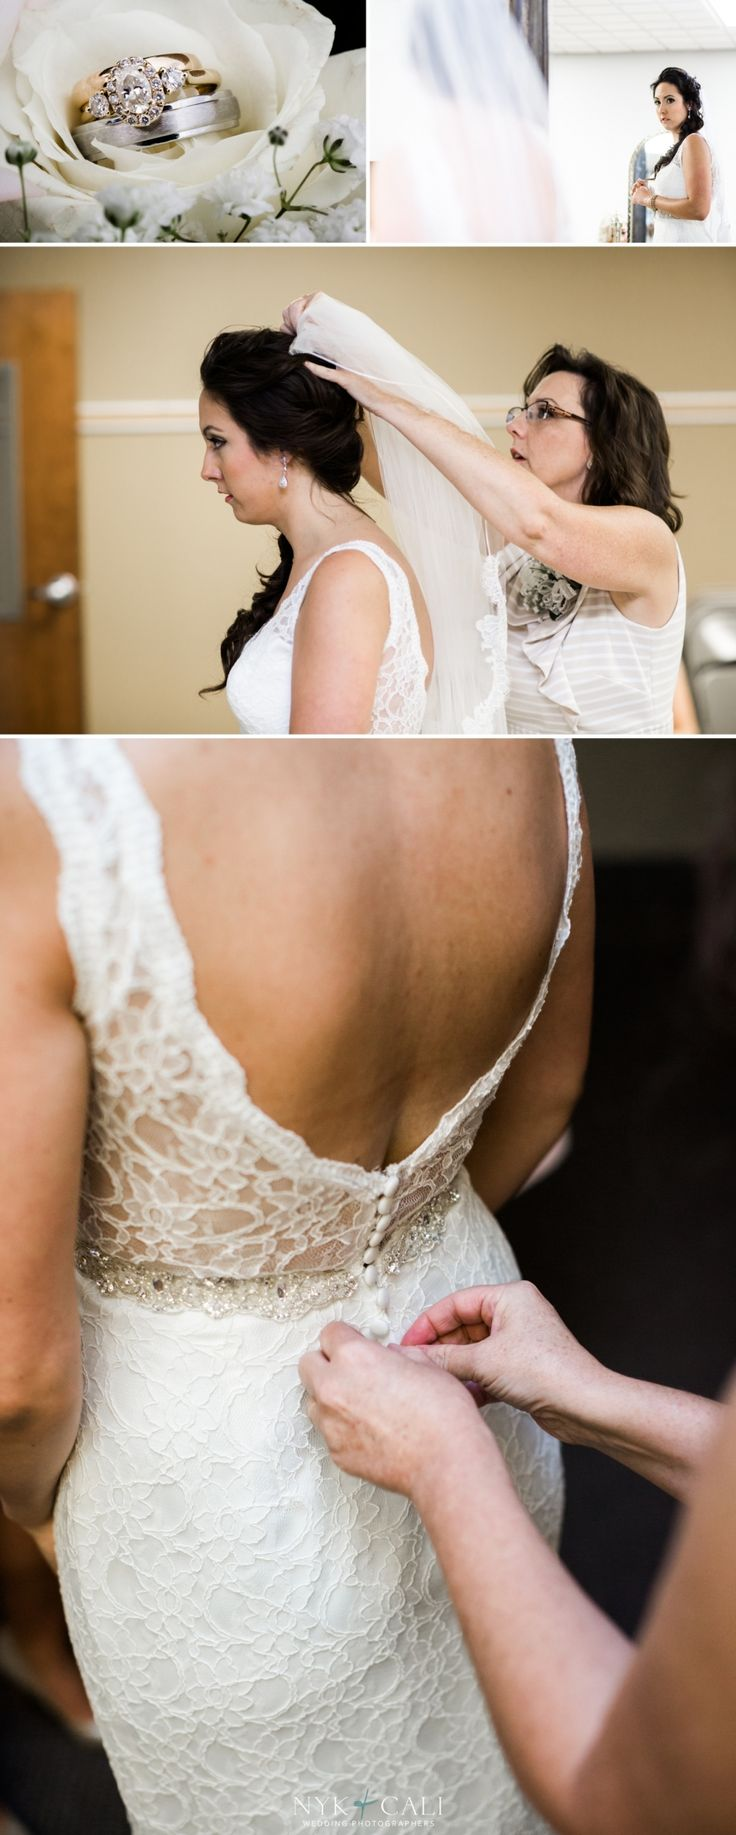 Nyk + Cali Wedding Photographers | Nashville, TN | Getting Ready | Ring | Detail | Dress |